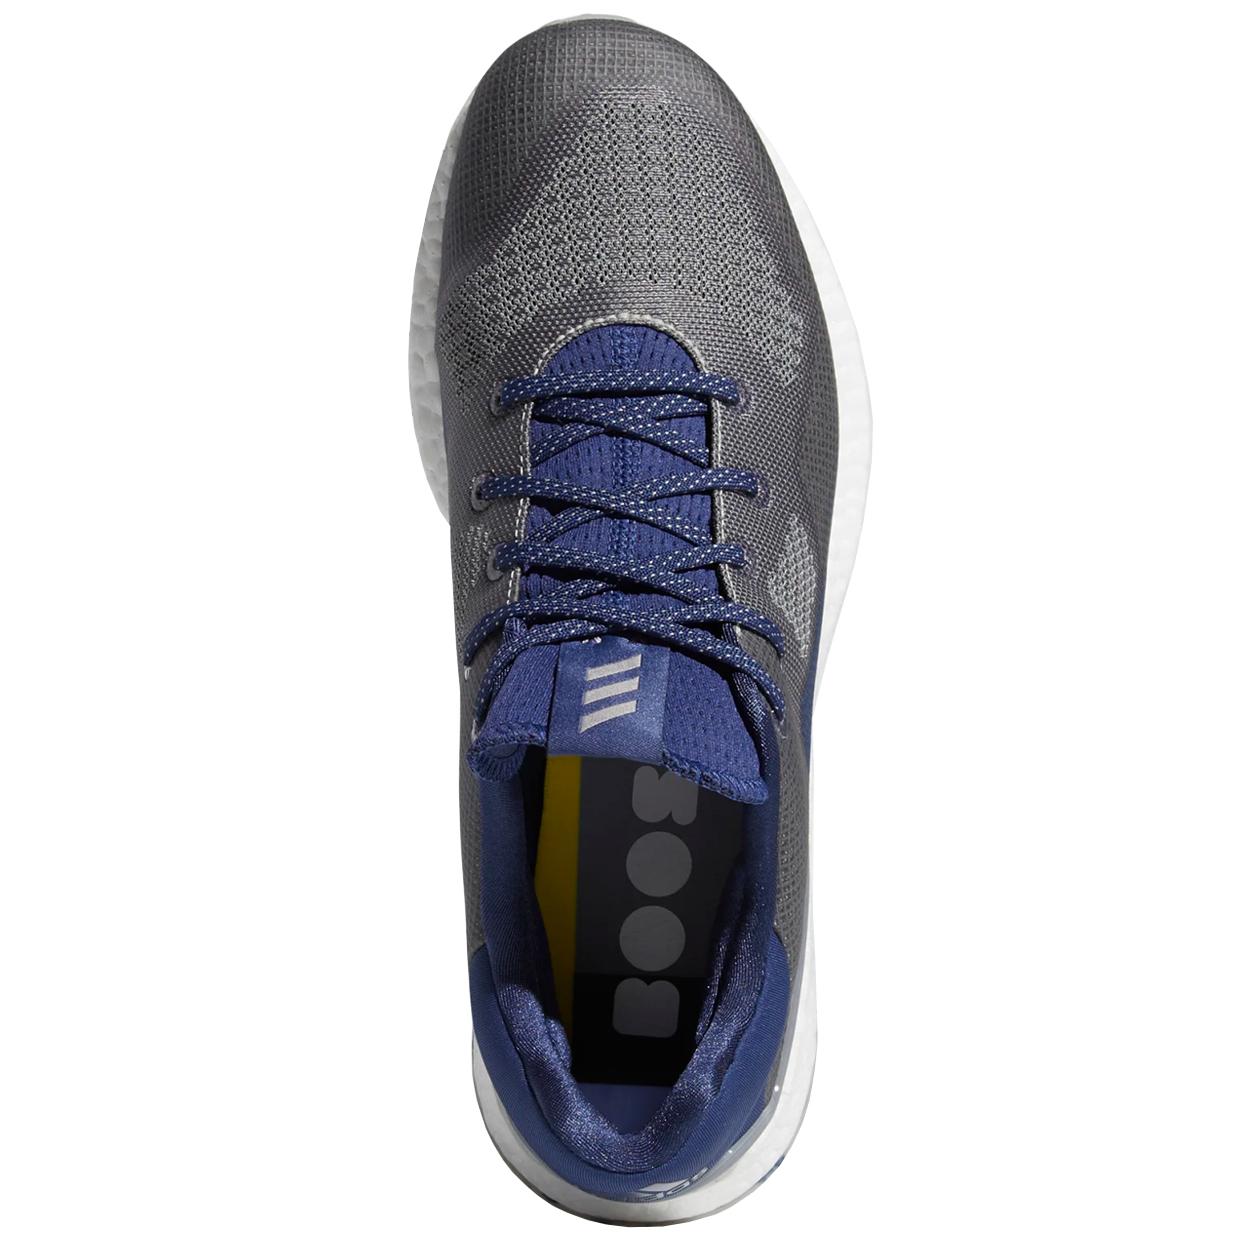 thumbnail 11 - Adidas Men's Crossknit DPR Spikeless Golf Shoes,  Brand New